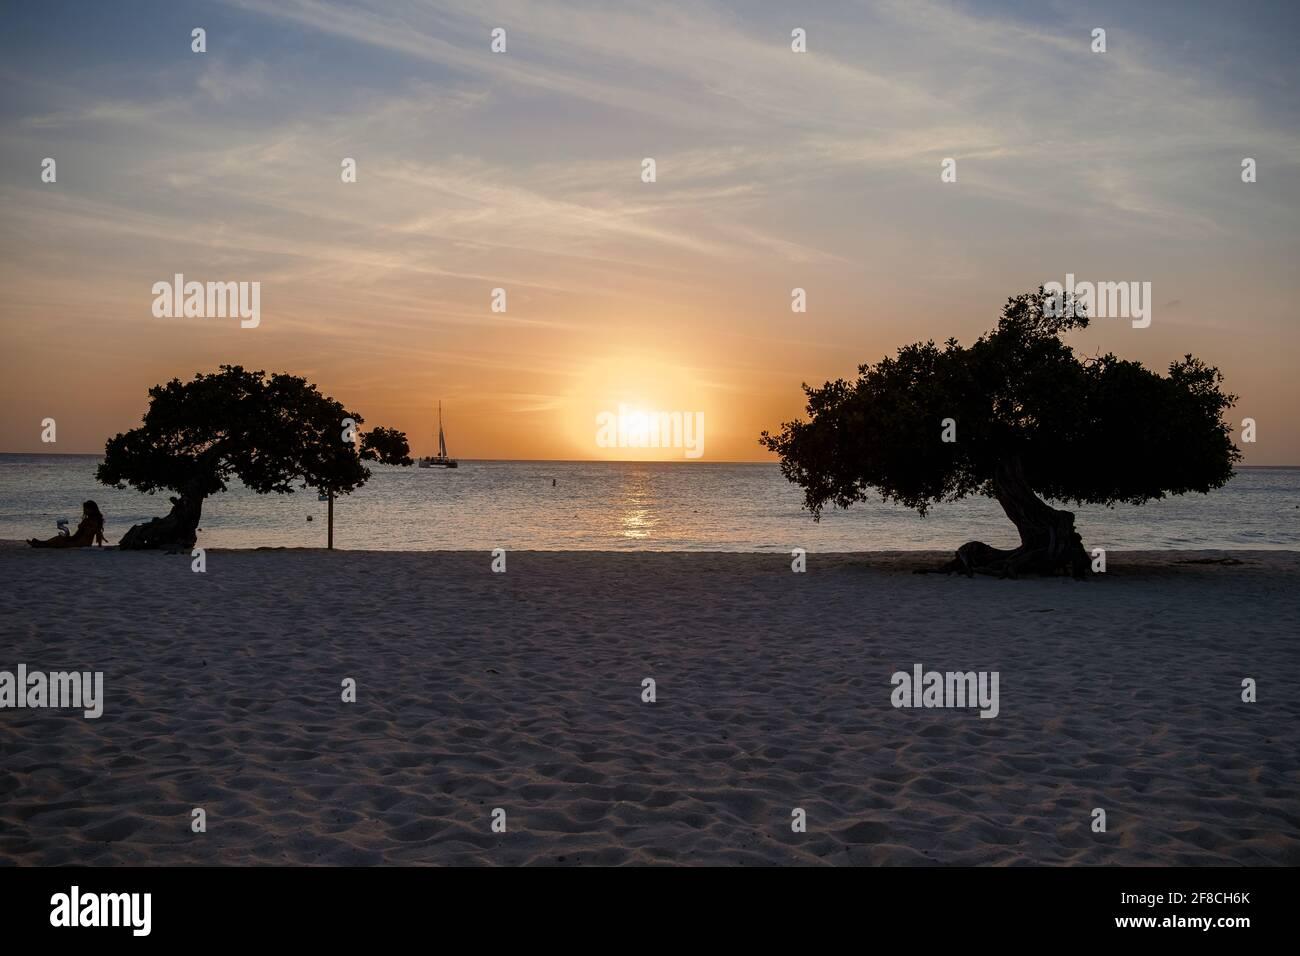 Sonnenuntergang am Eagle Beach Aruba, Divi Tauchen Sie Bäume an der Küste von Eagle Beach in Aruba. Stockfoto